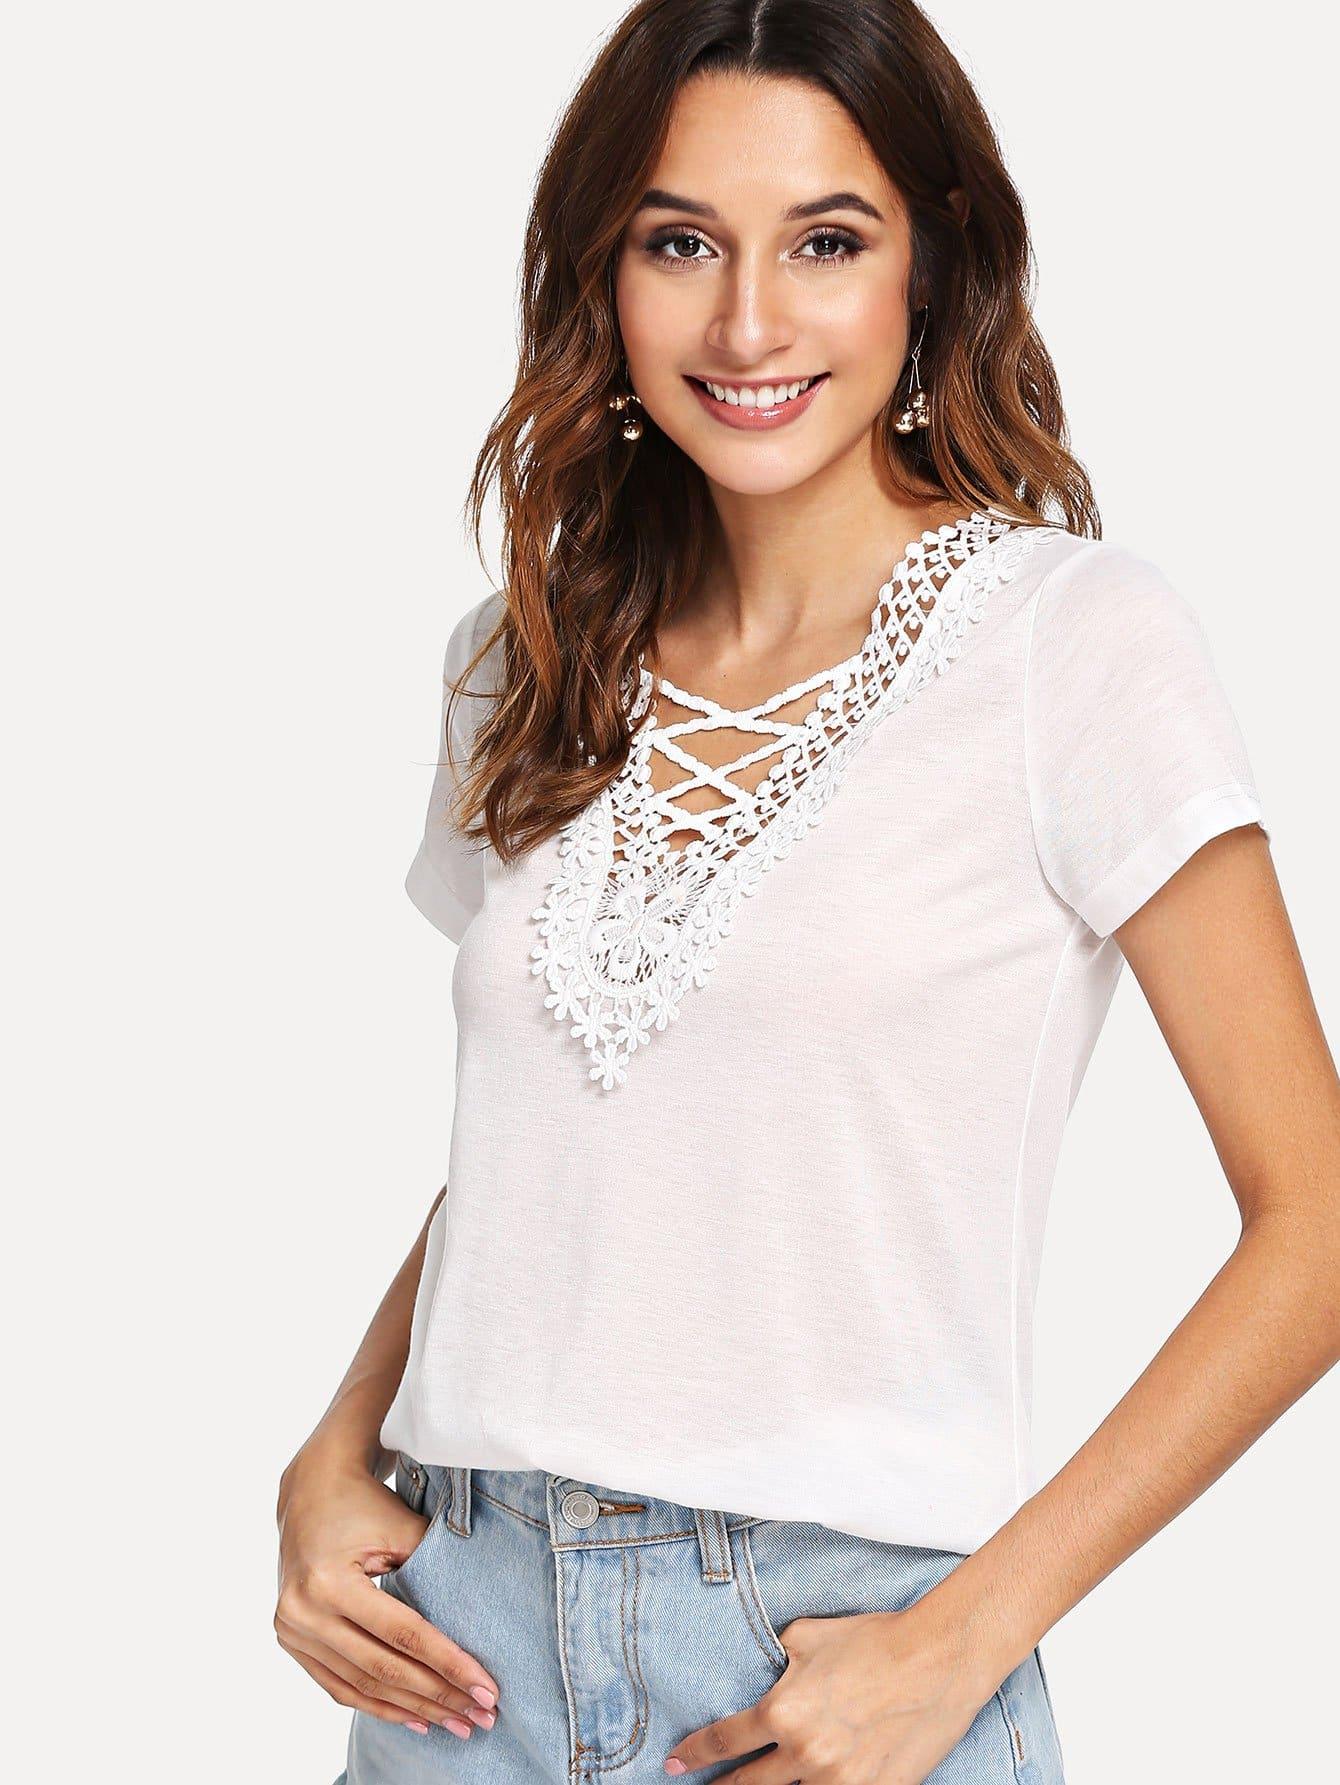 Купить Кружевная кружевная кружевная аппликационная блузка, Gabi B, SheIn